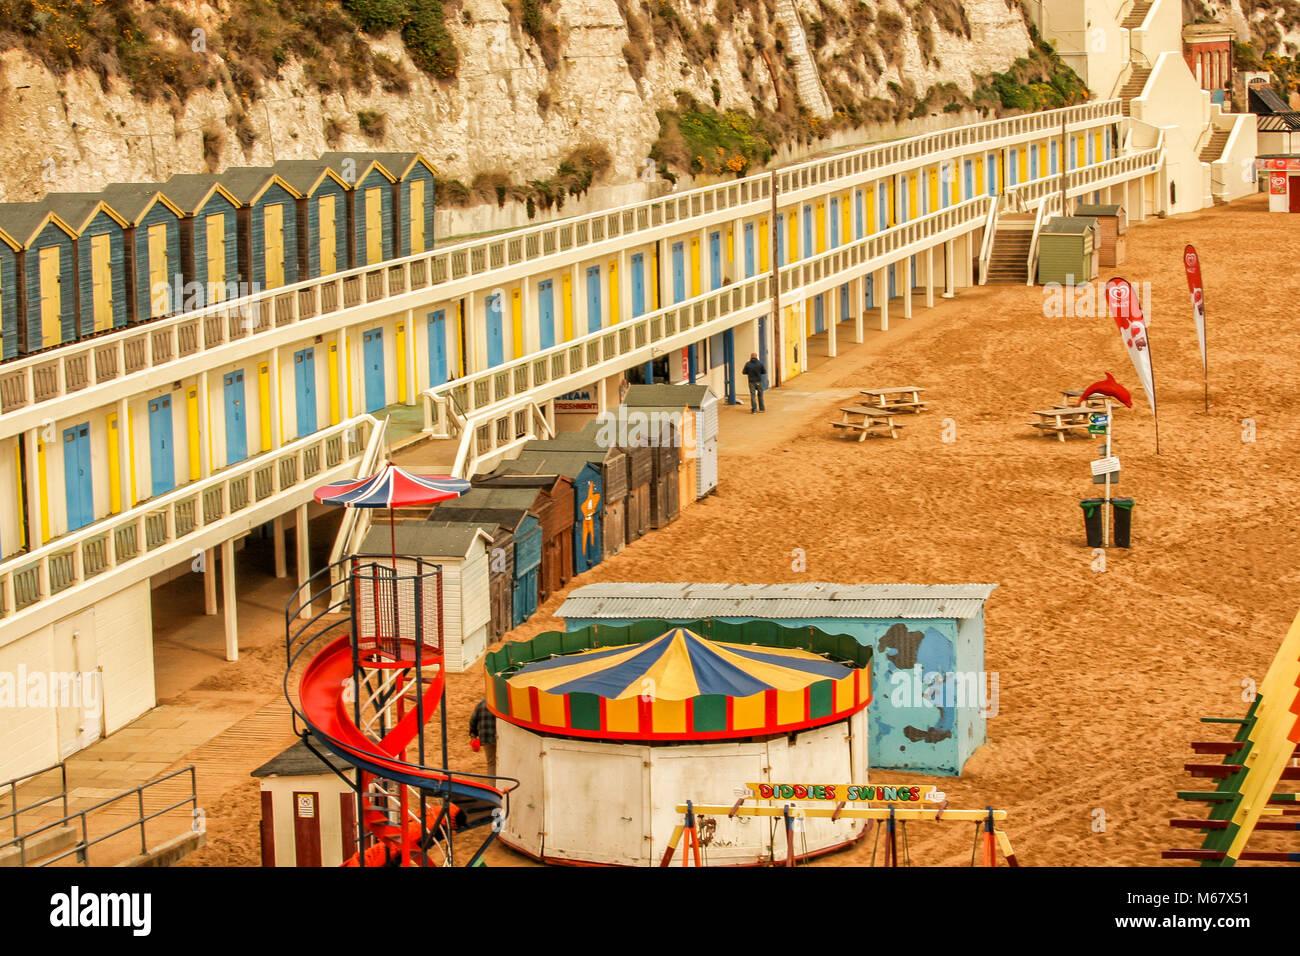 Viking Bay beach, Broadstairs, Kent, England - Stock Image